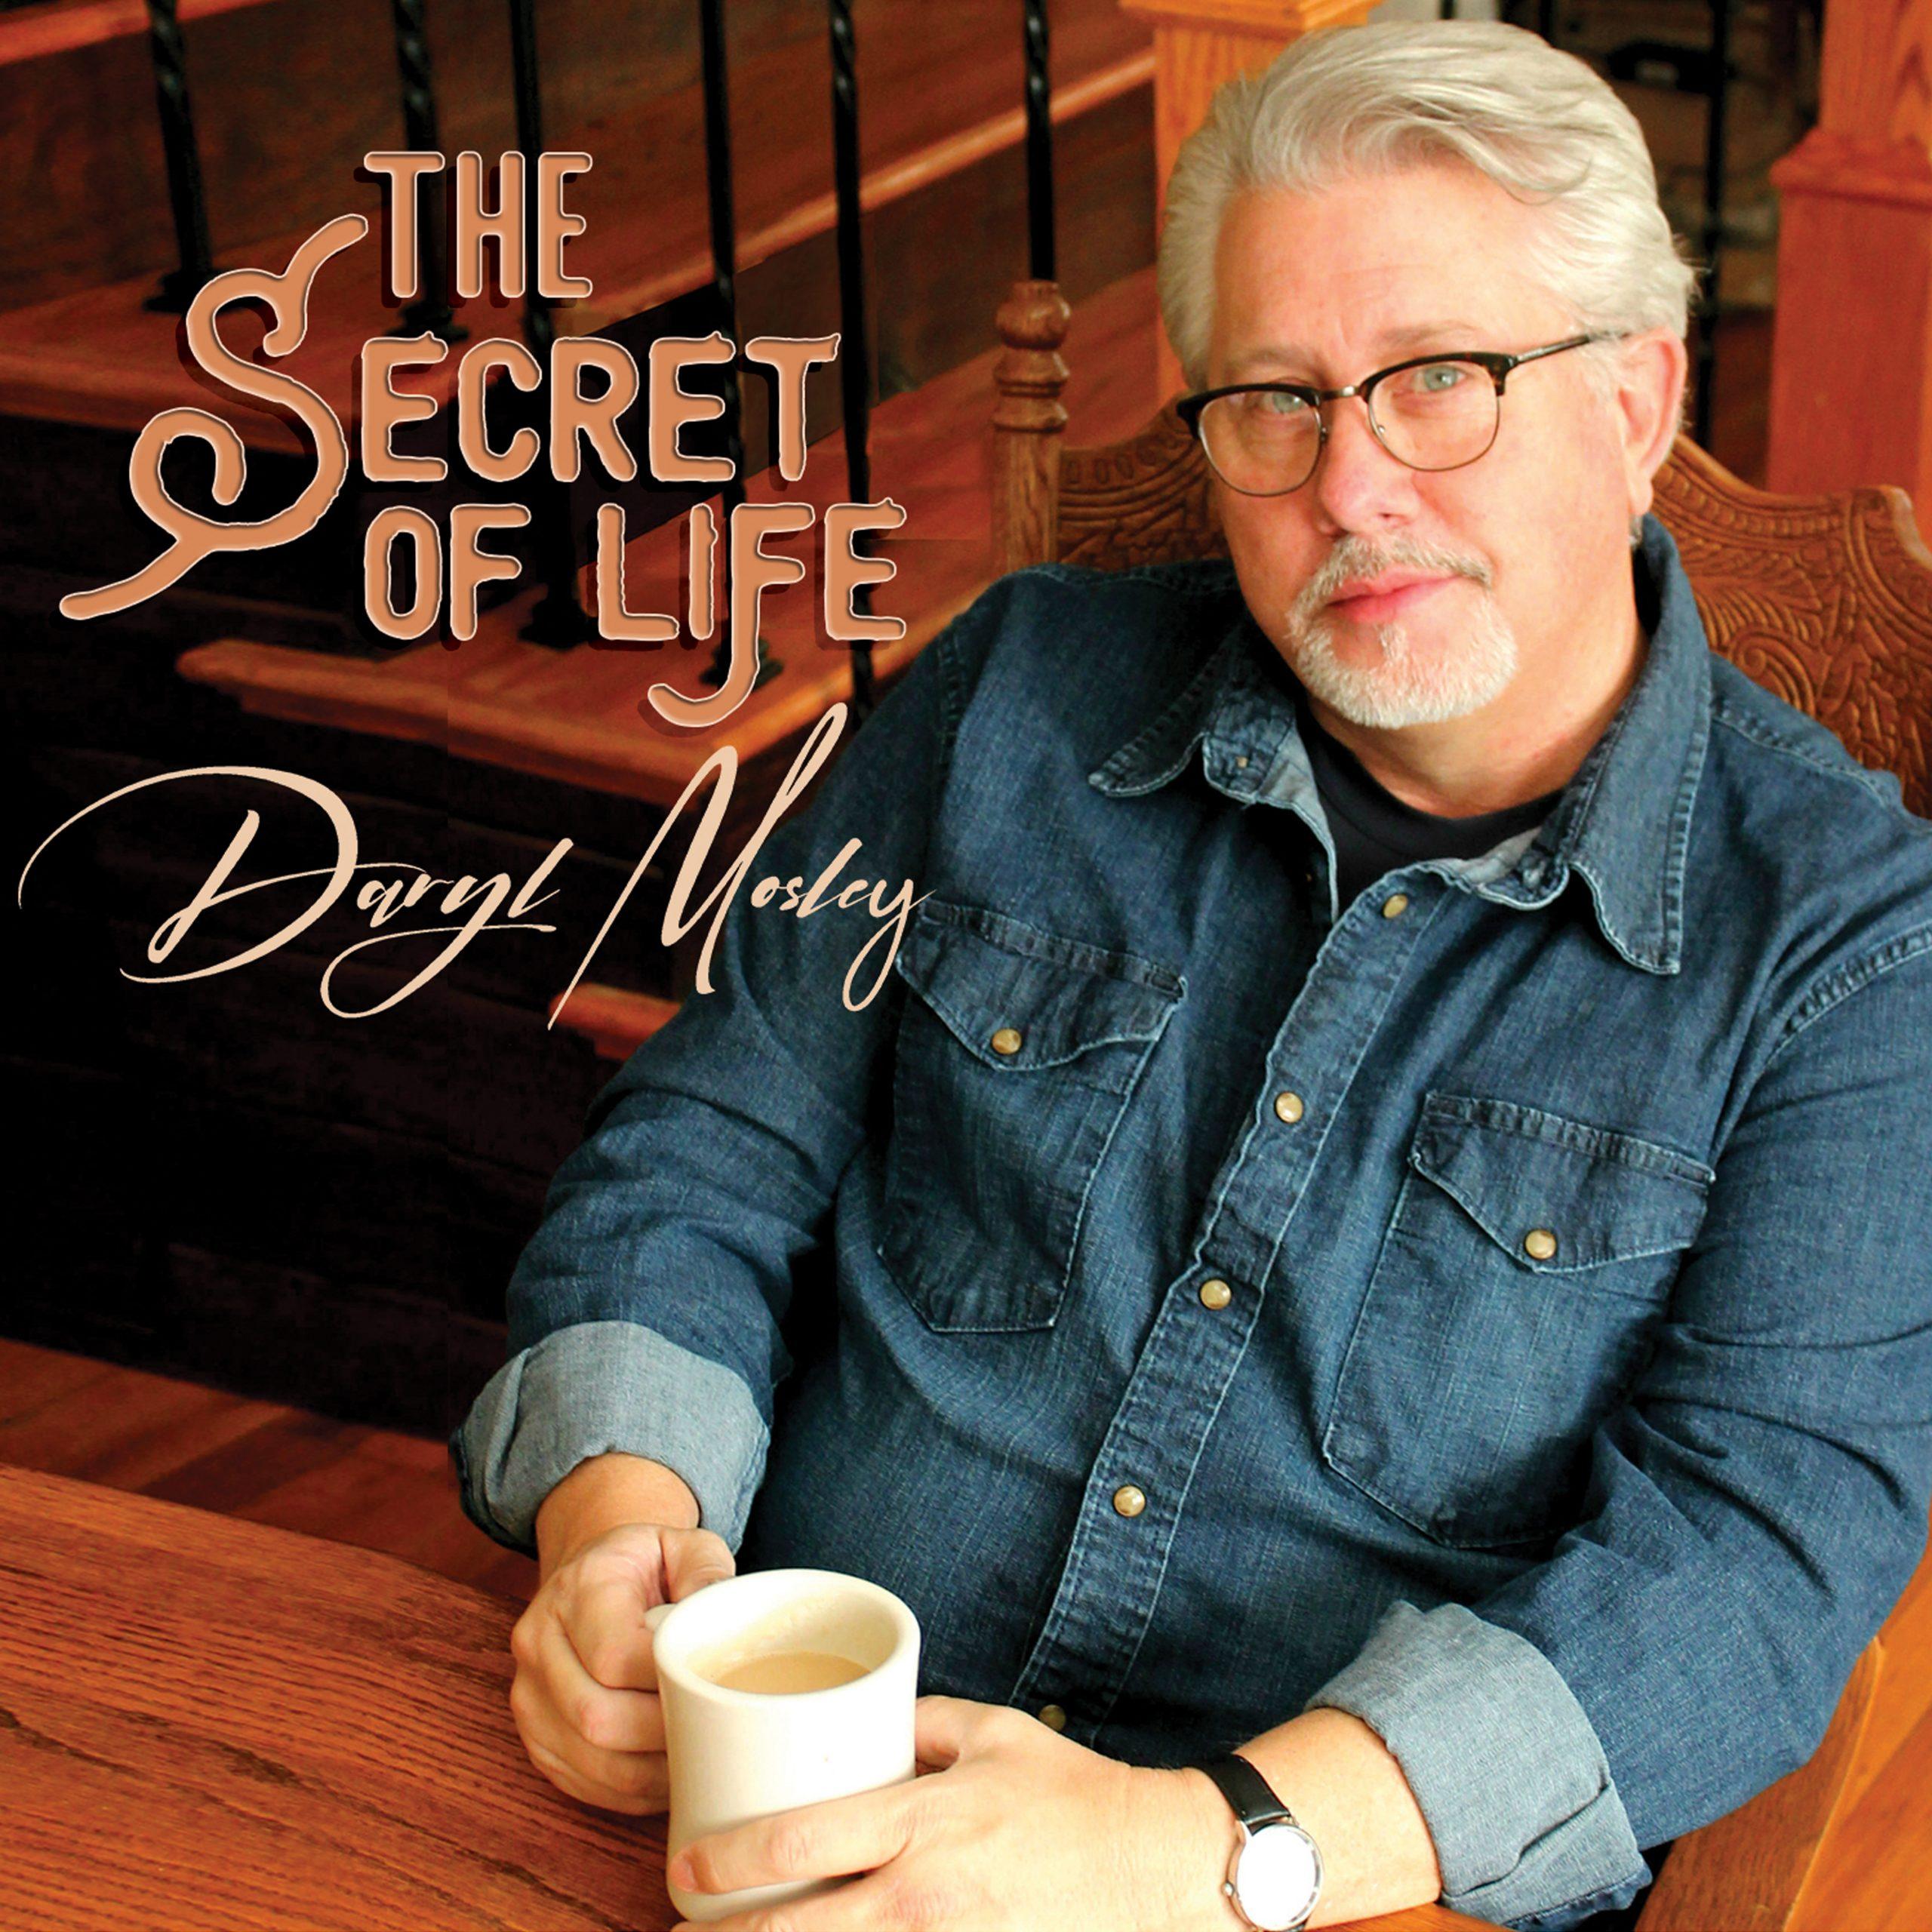 The-Secret-Of-Life-album-cover-5000x5000-1-1-scaled.jpg